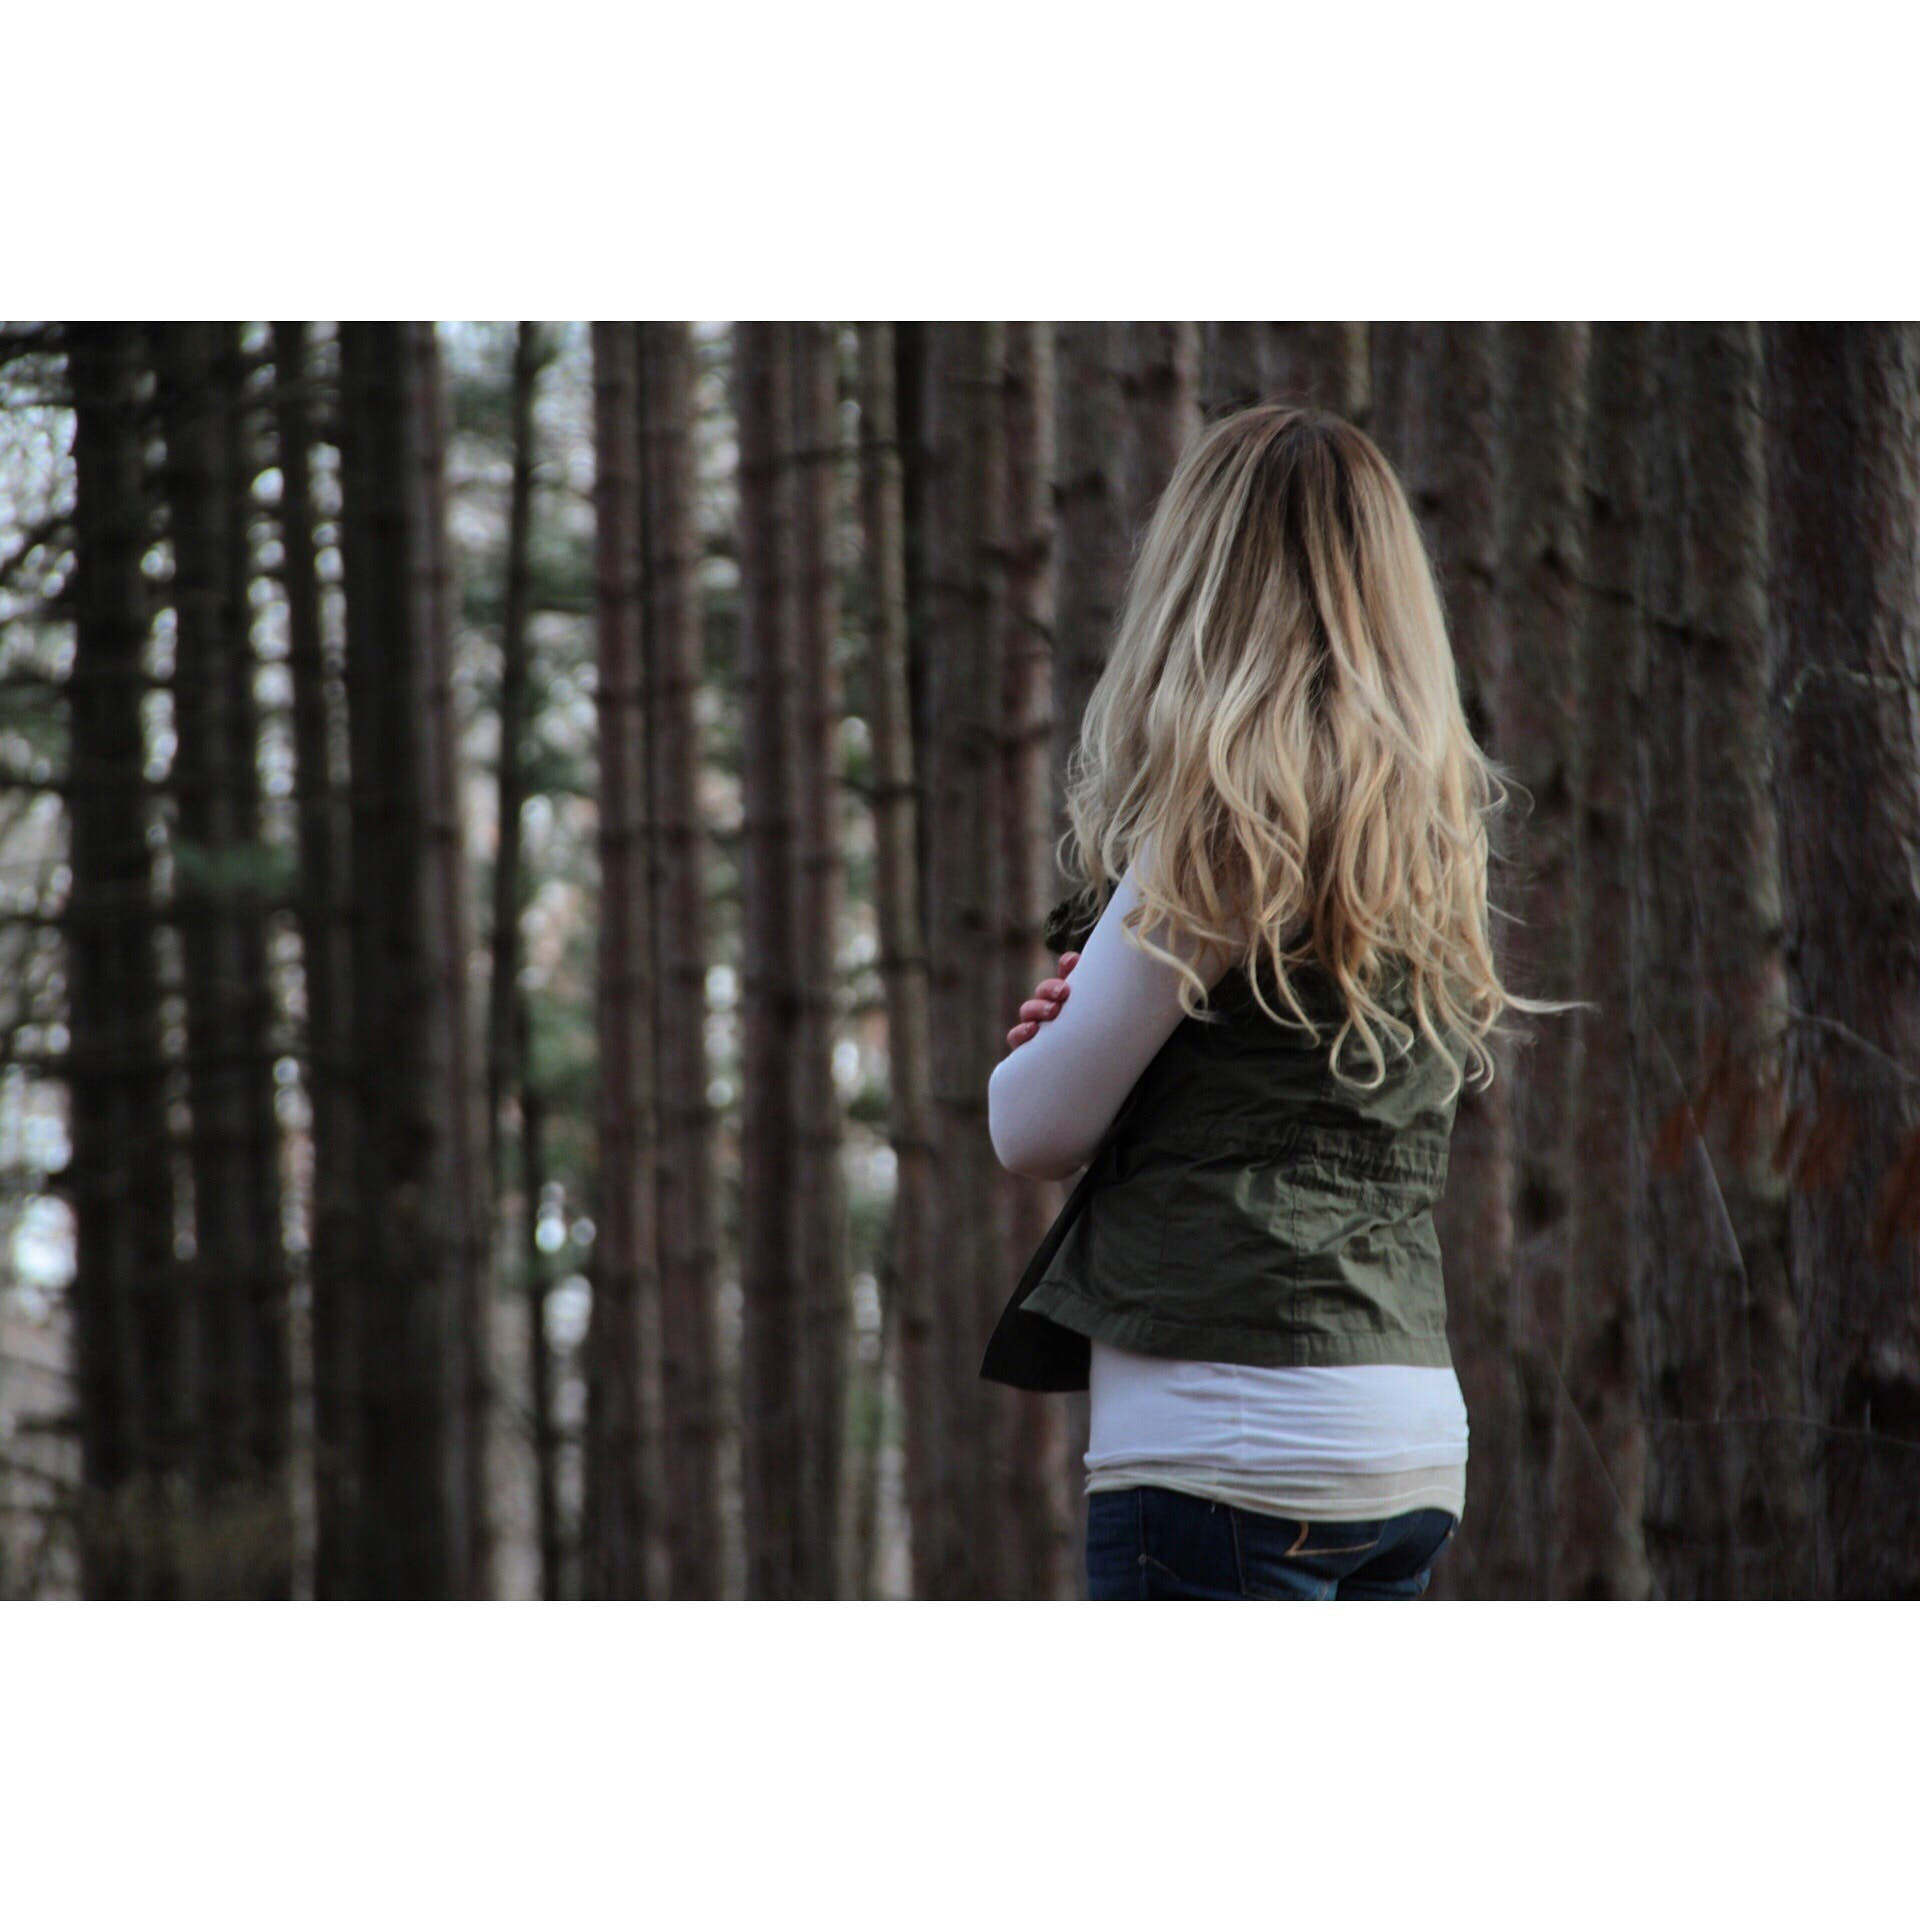 Kostenloses Stock Foto zu bäume, blond, fashion, frau